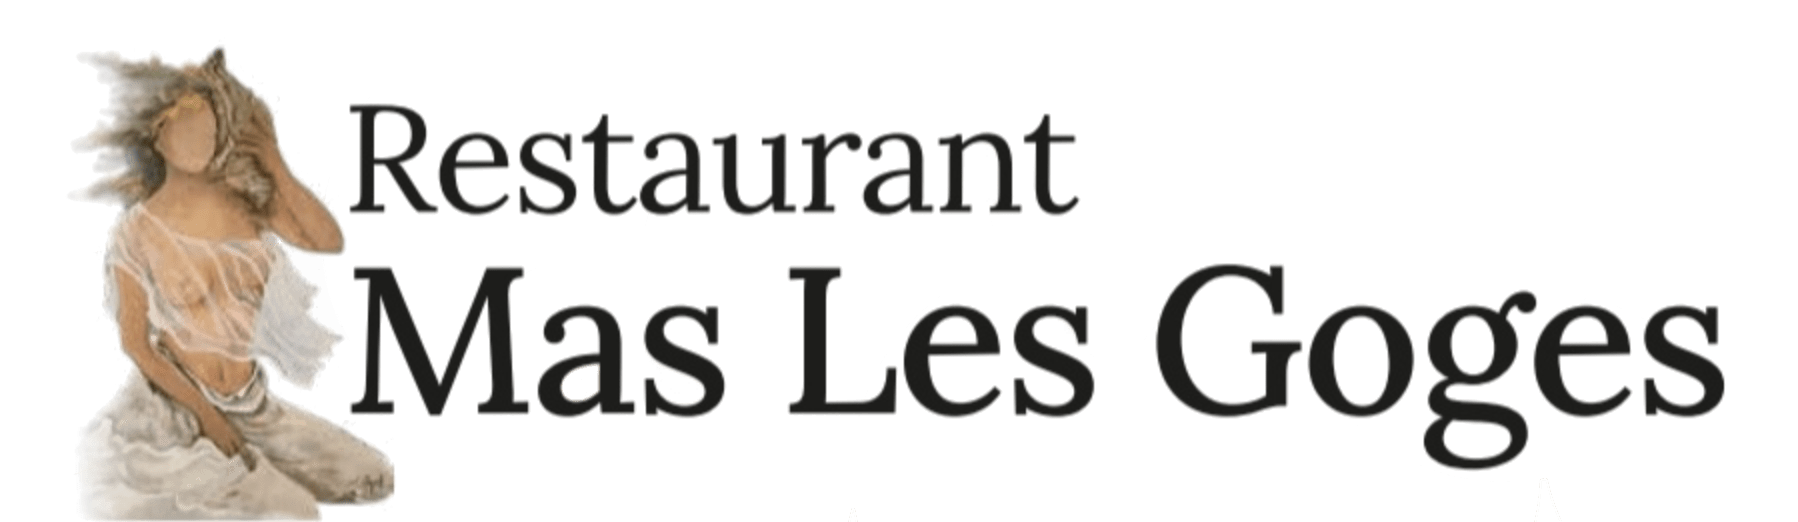 Mas Les Goges | Masia Restaurant